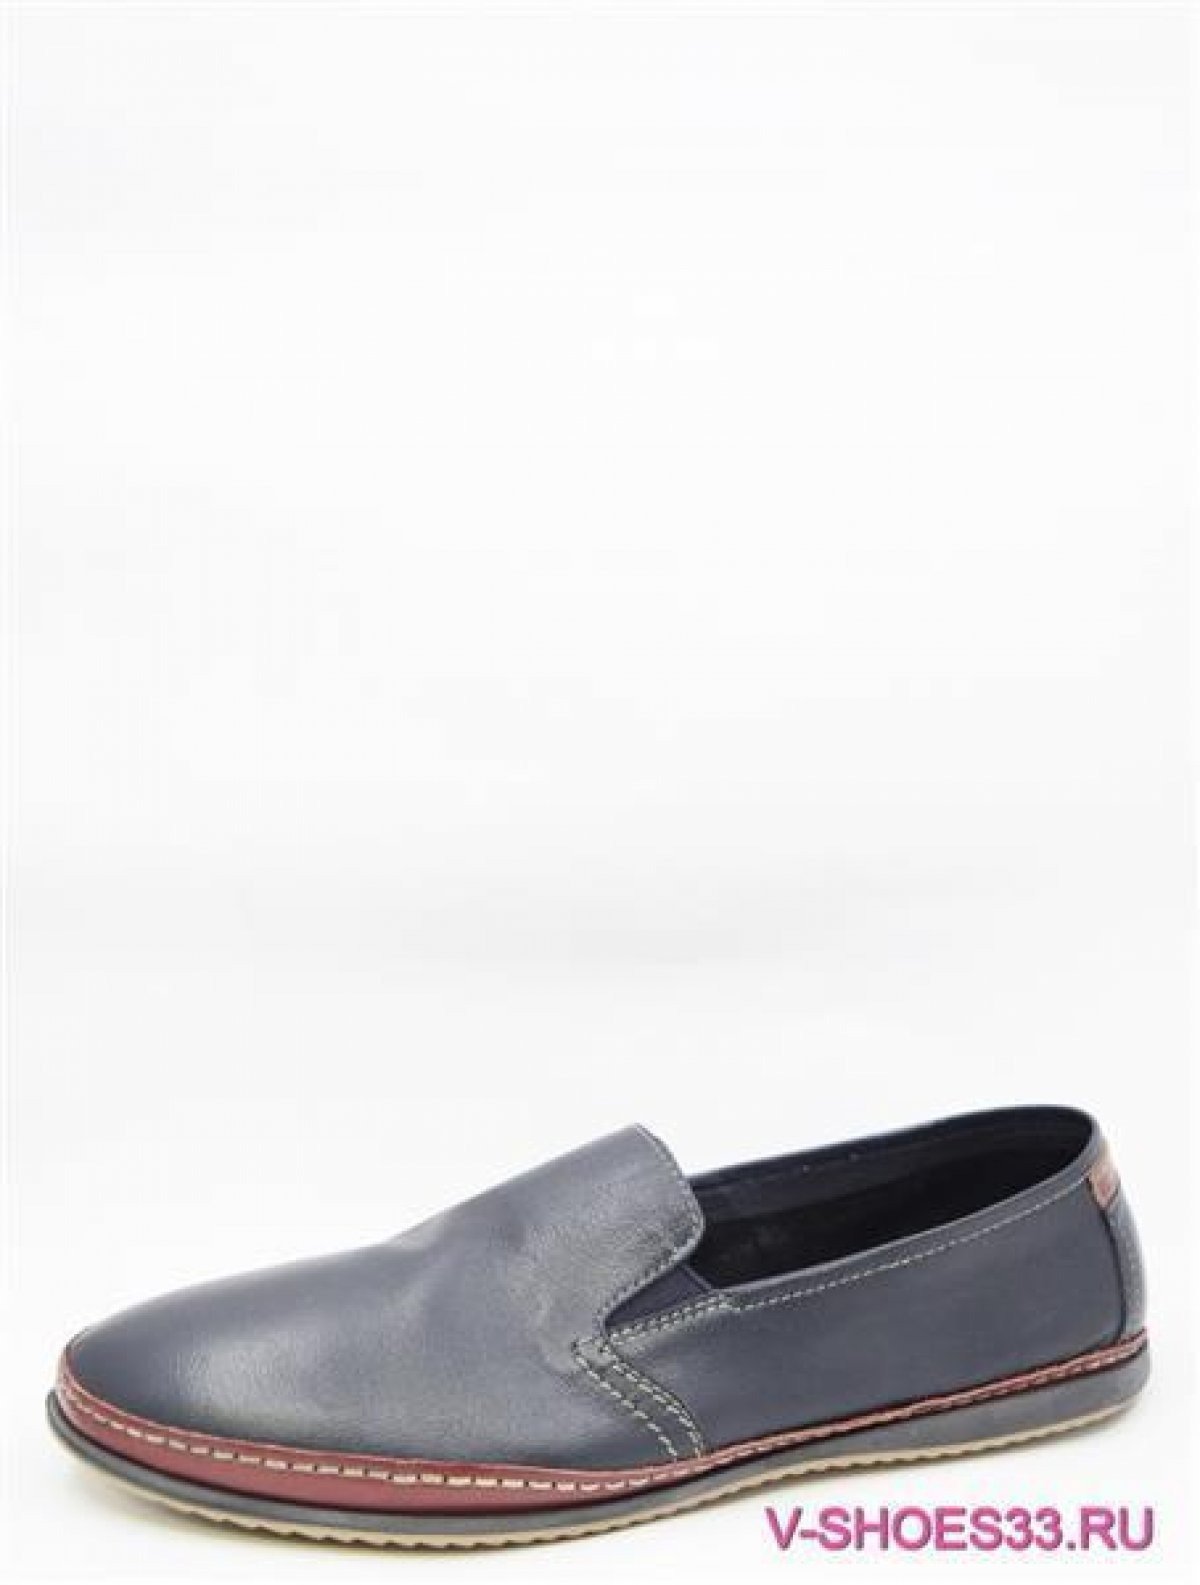 K83-075674 мужские туфли